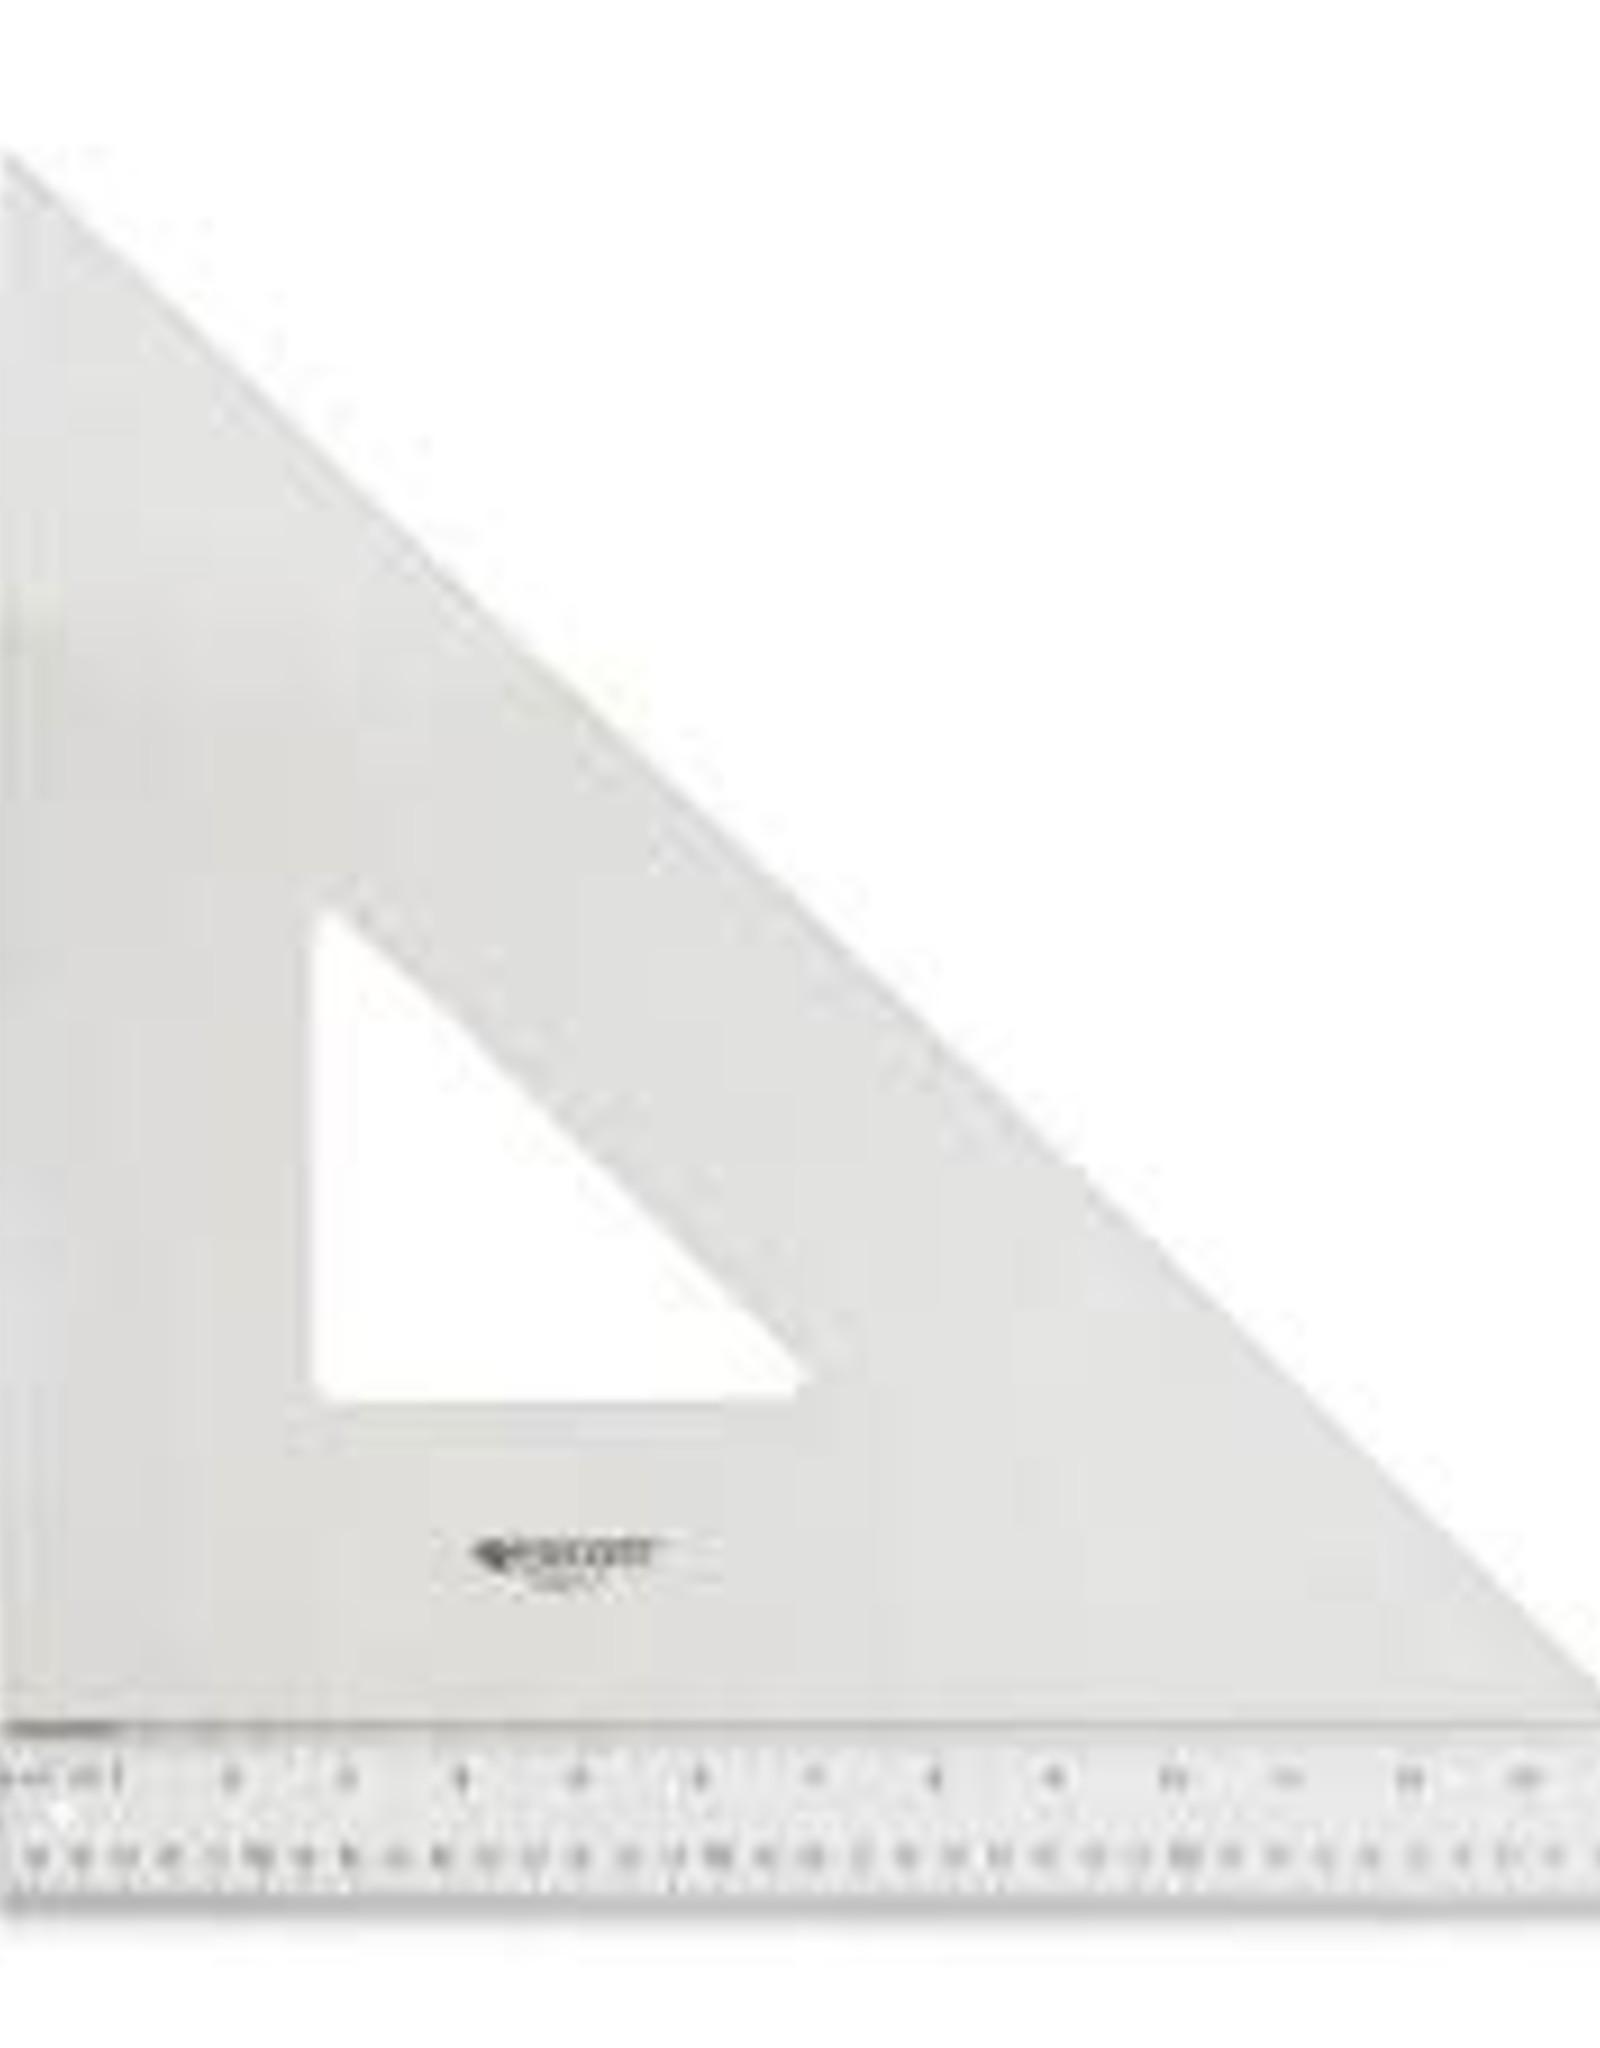 "Wescott 14"" Professional Triangle-45/90"